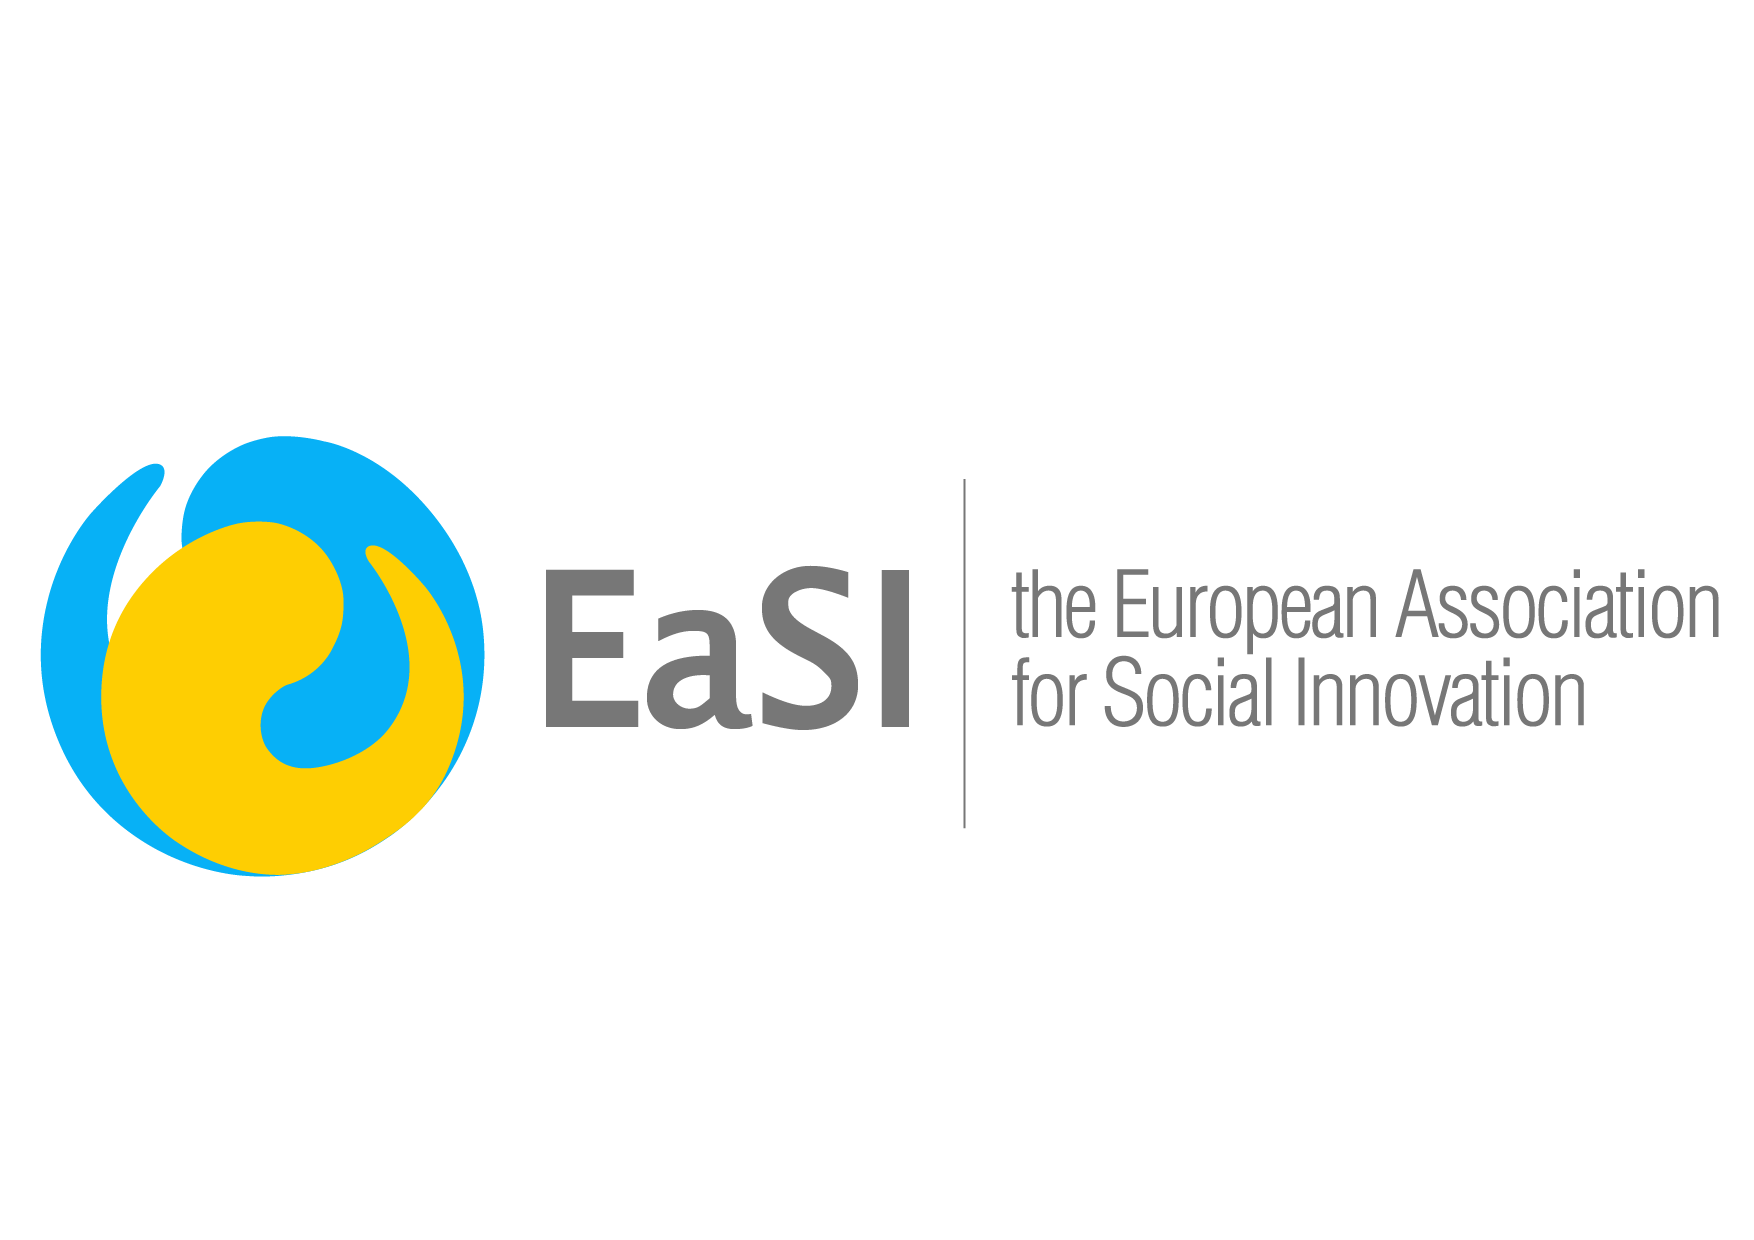 Asociatia European Association for Social Inovation